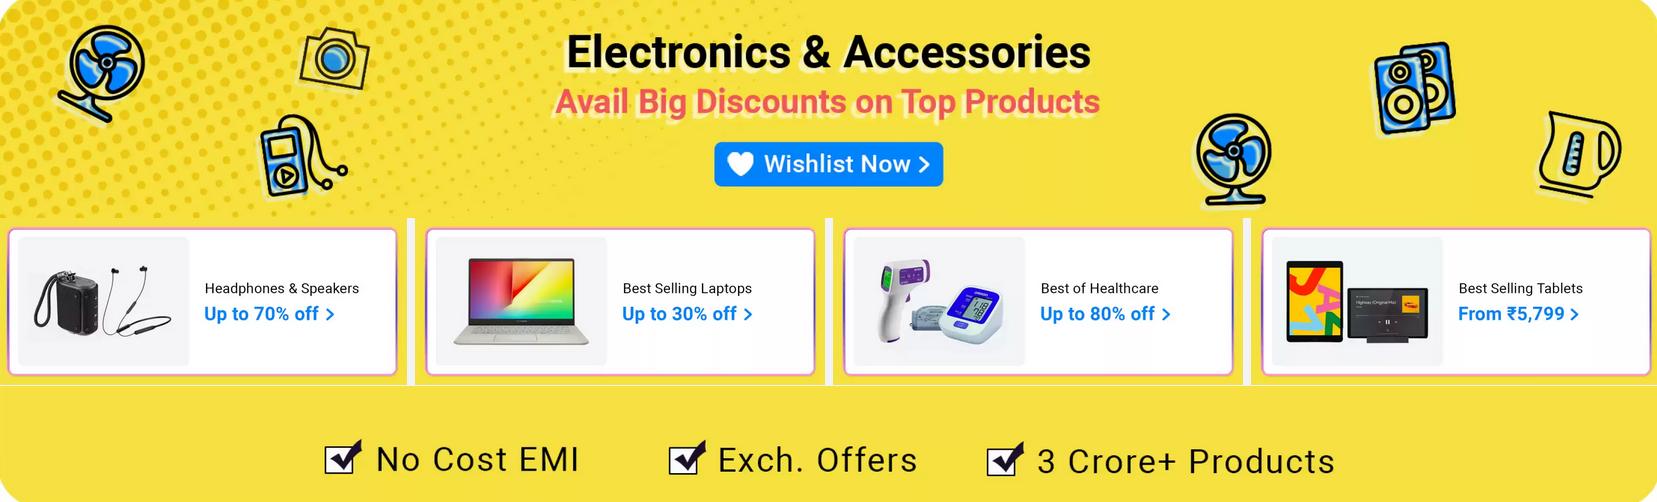 Flipkart electronics sale and offers 2020